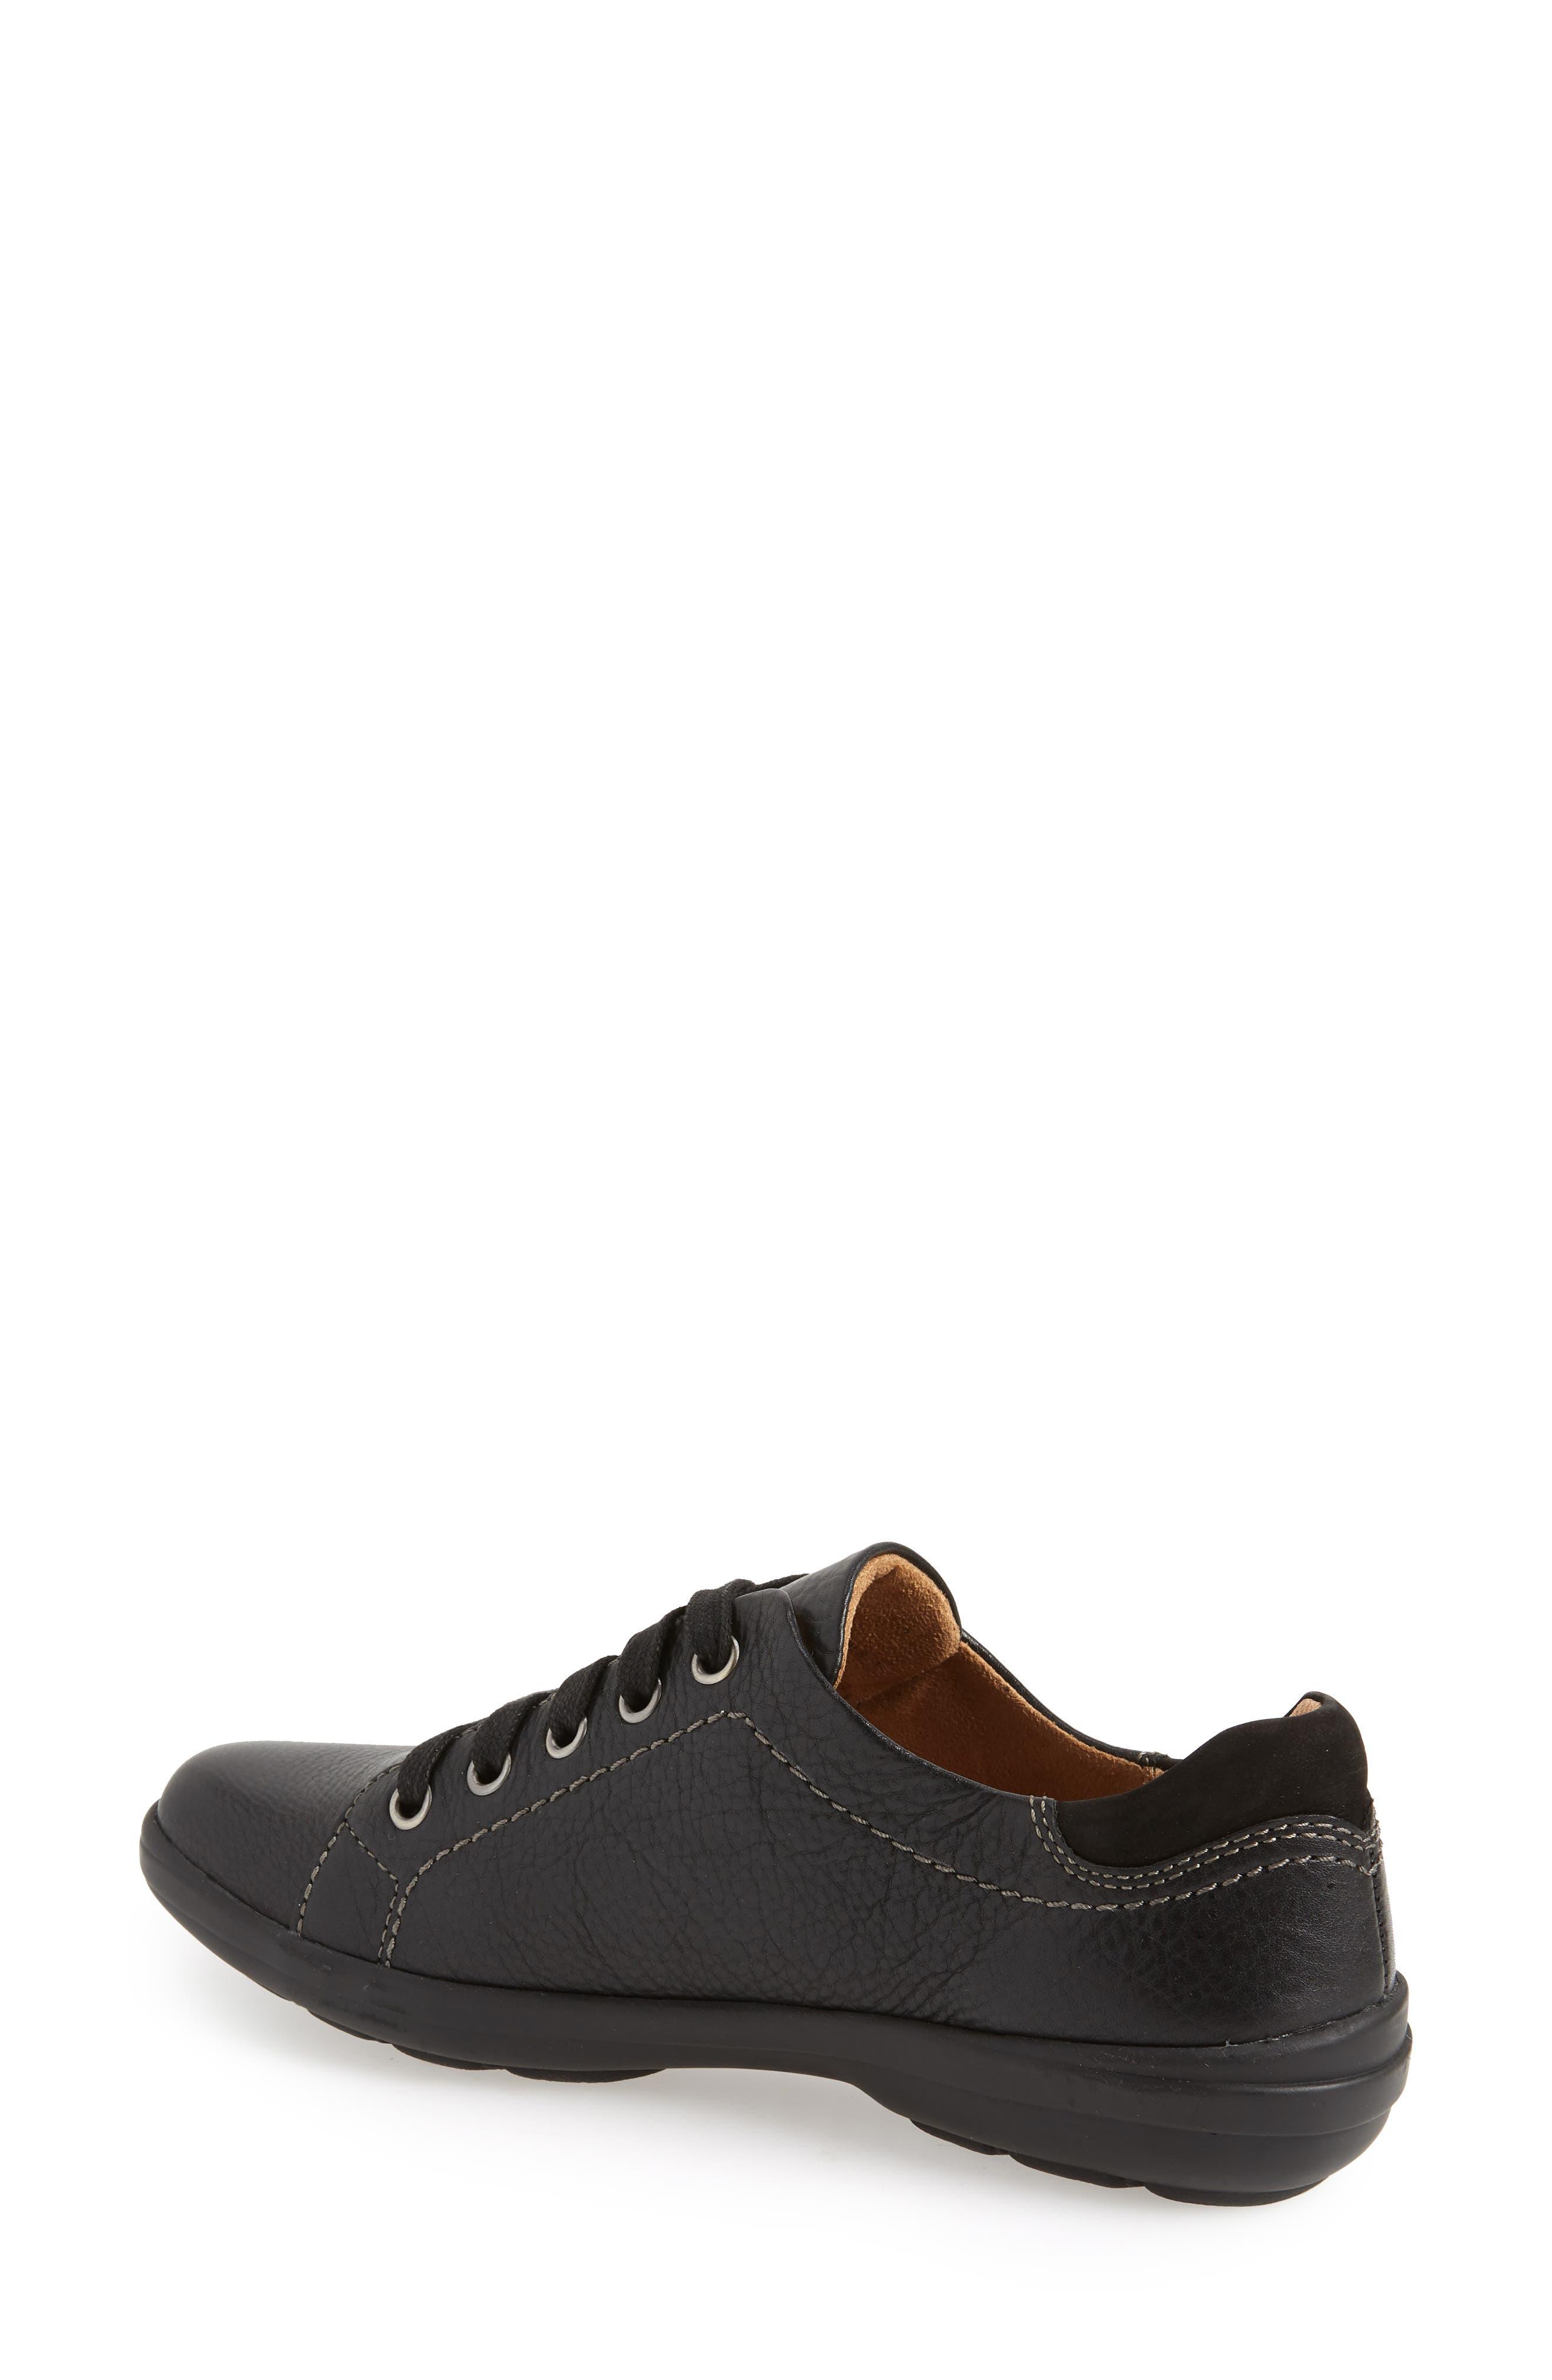 Reston Sneaker,                             Alternate thumbnail 2, color,                             BLACK